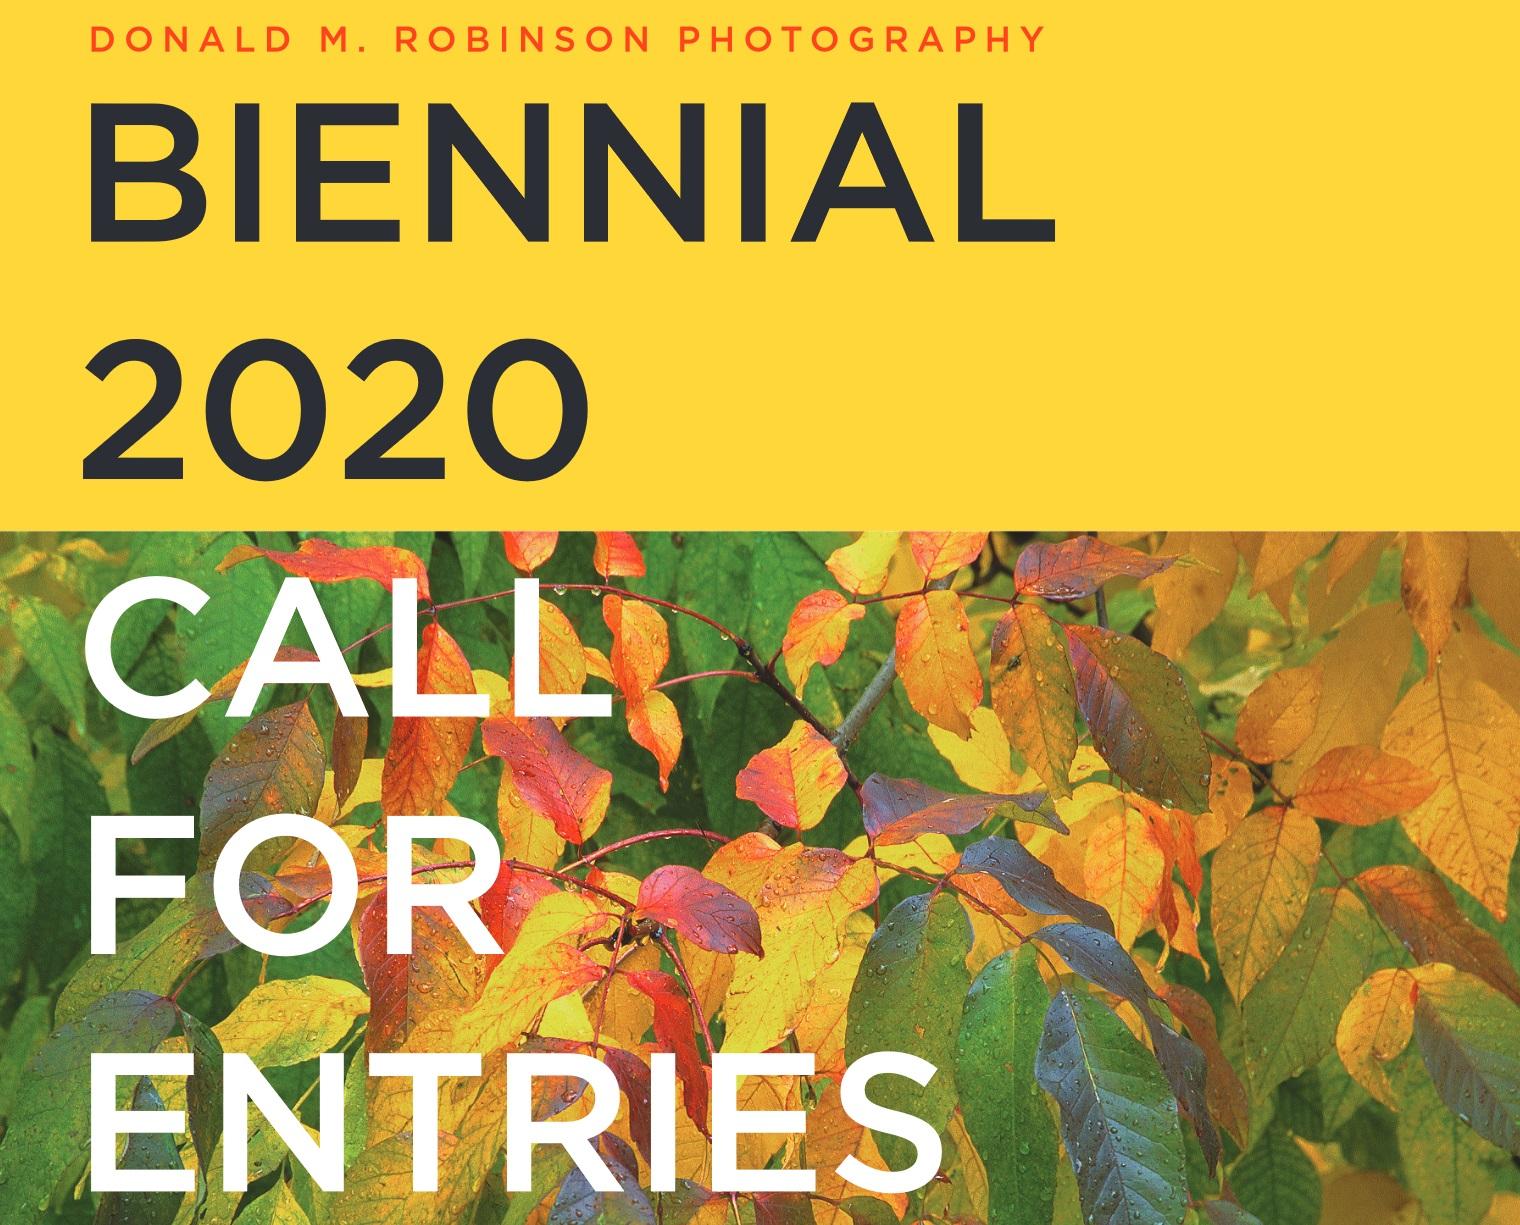 Donald M. Robinson Photography Biennial 2020 - logo